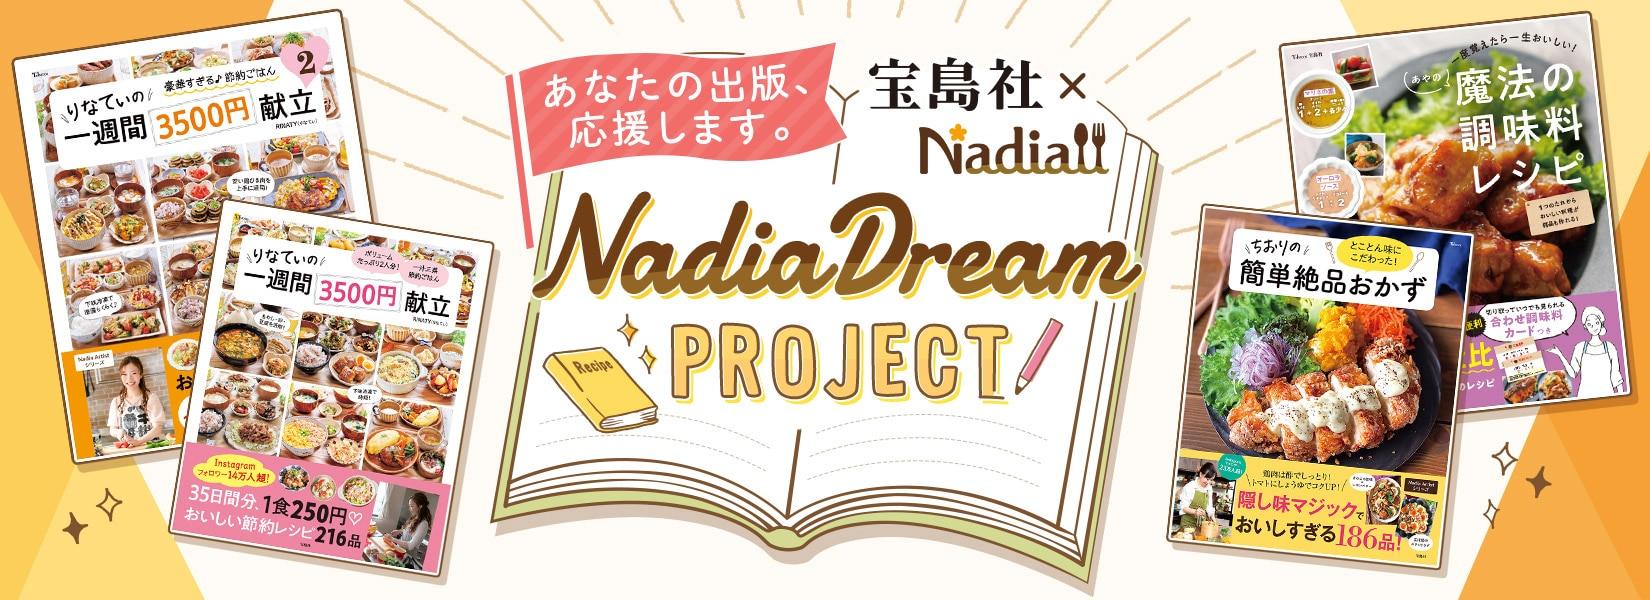 Nadia Dream Project